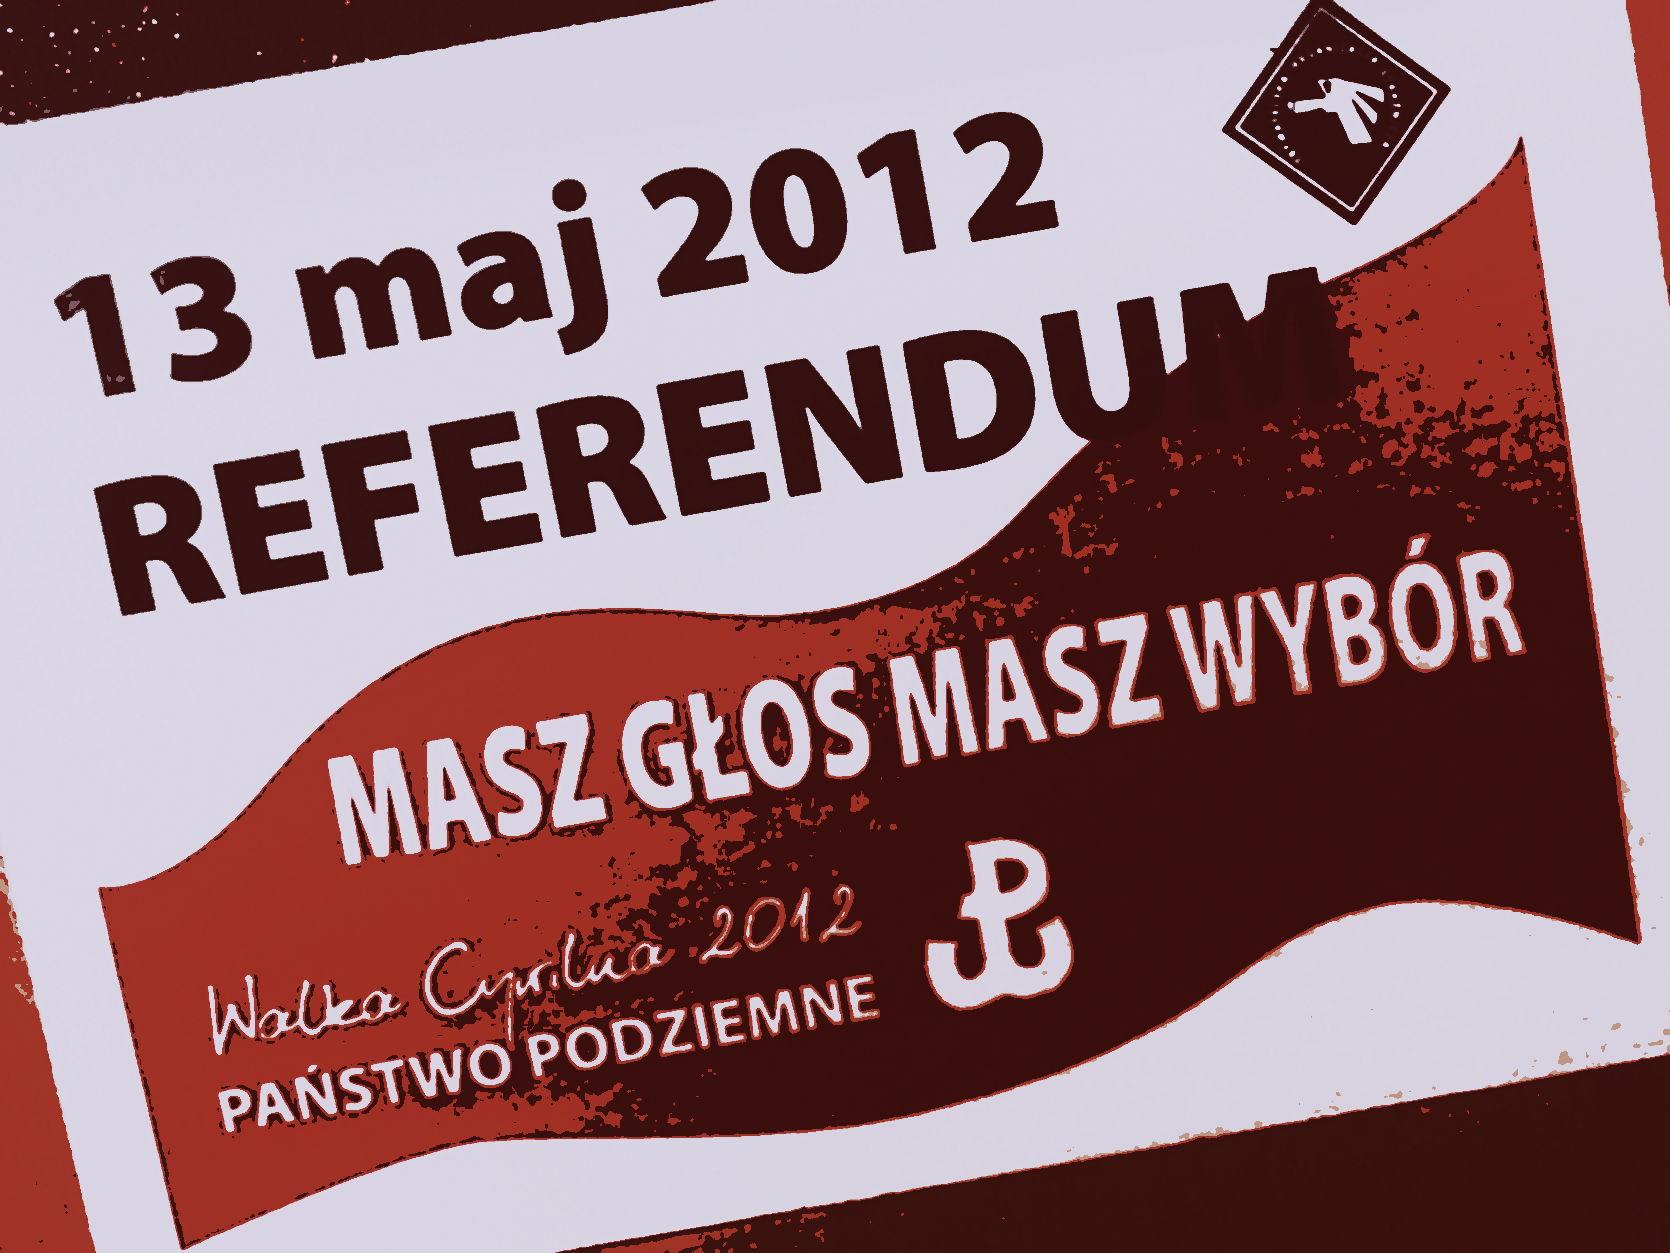 referednum 13 maja (b)